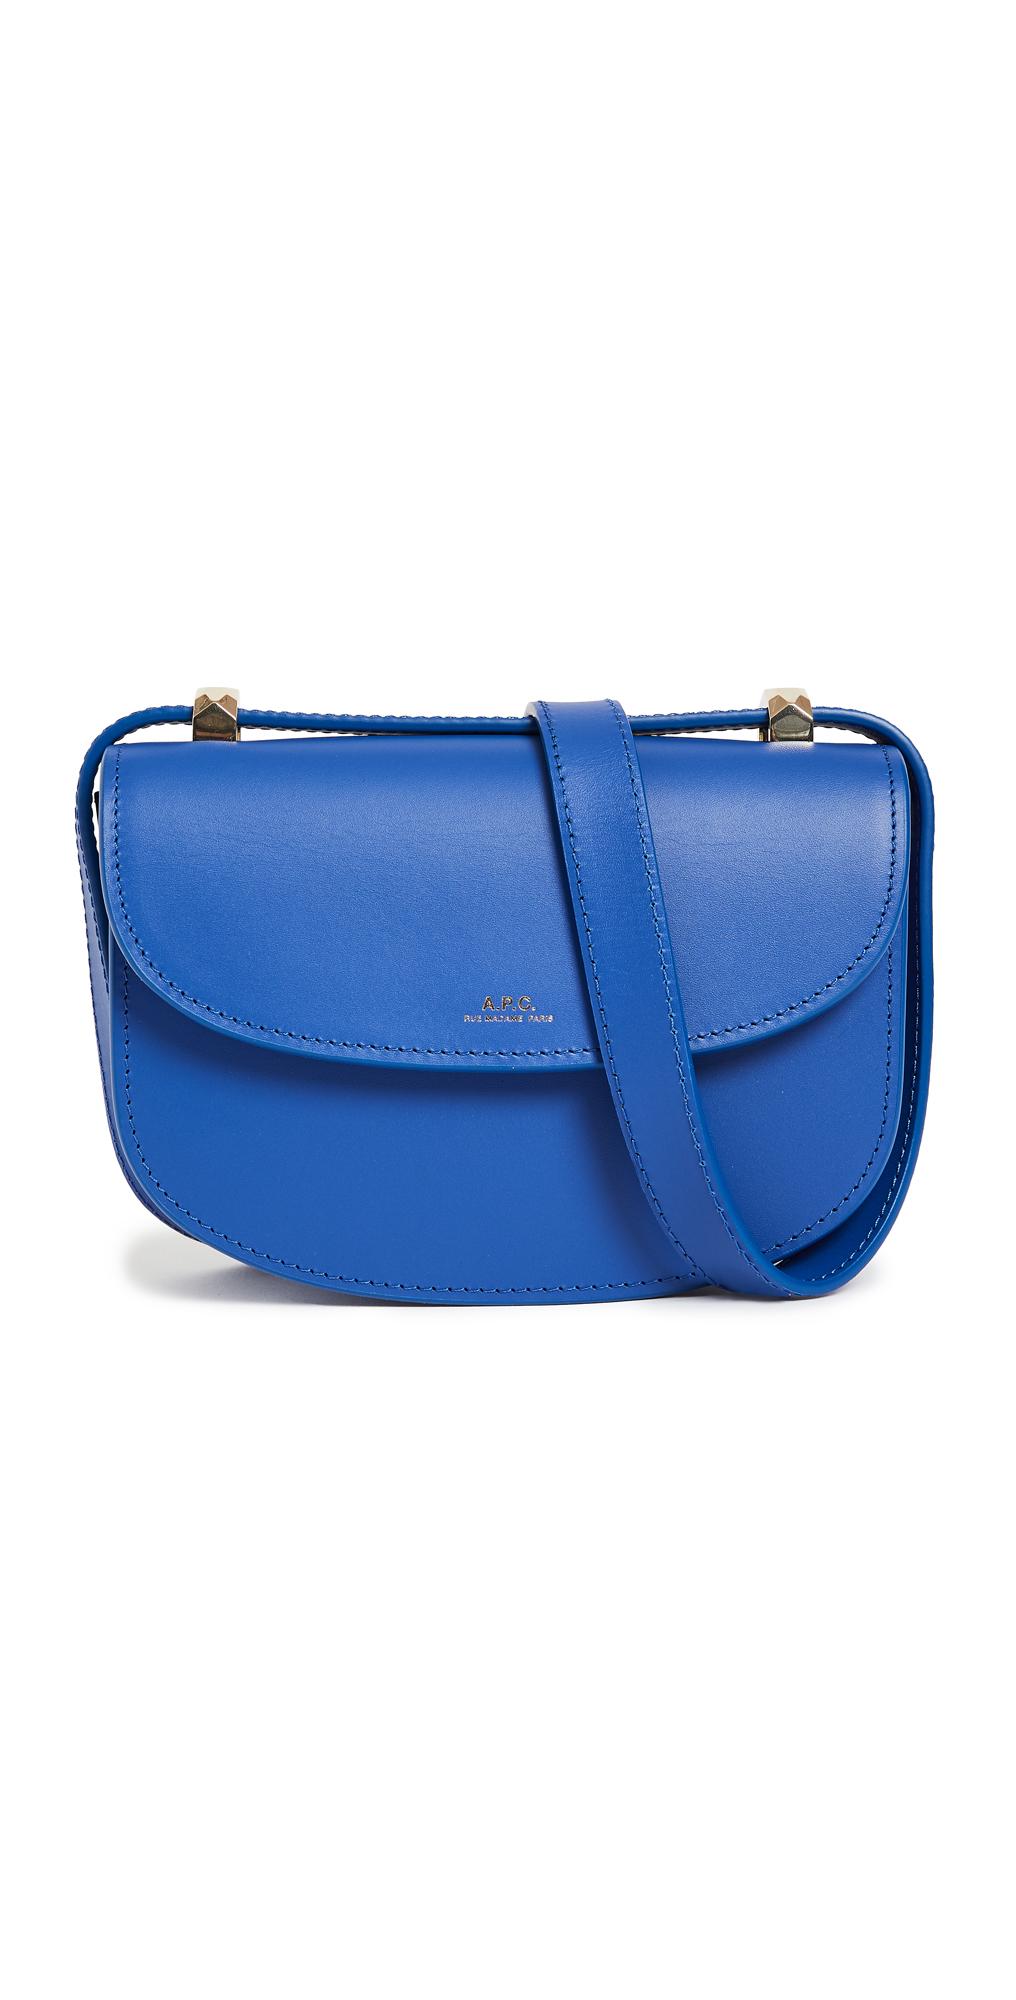 A.P.C. Sac Geneve Mini Bag